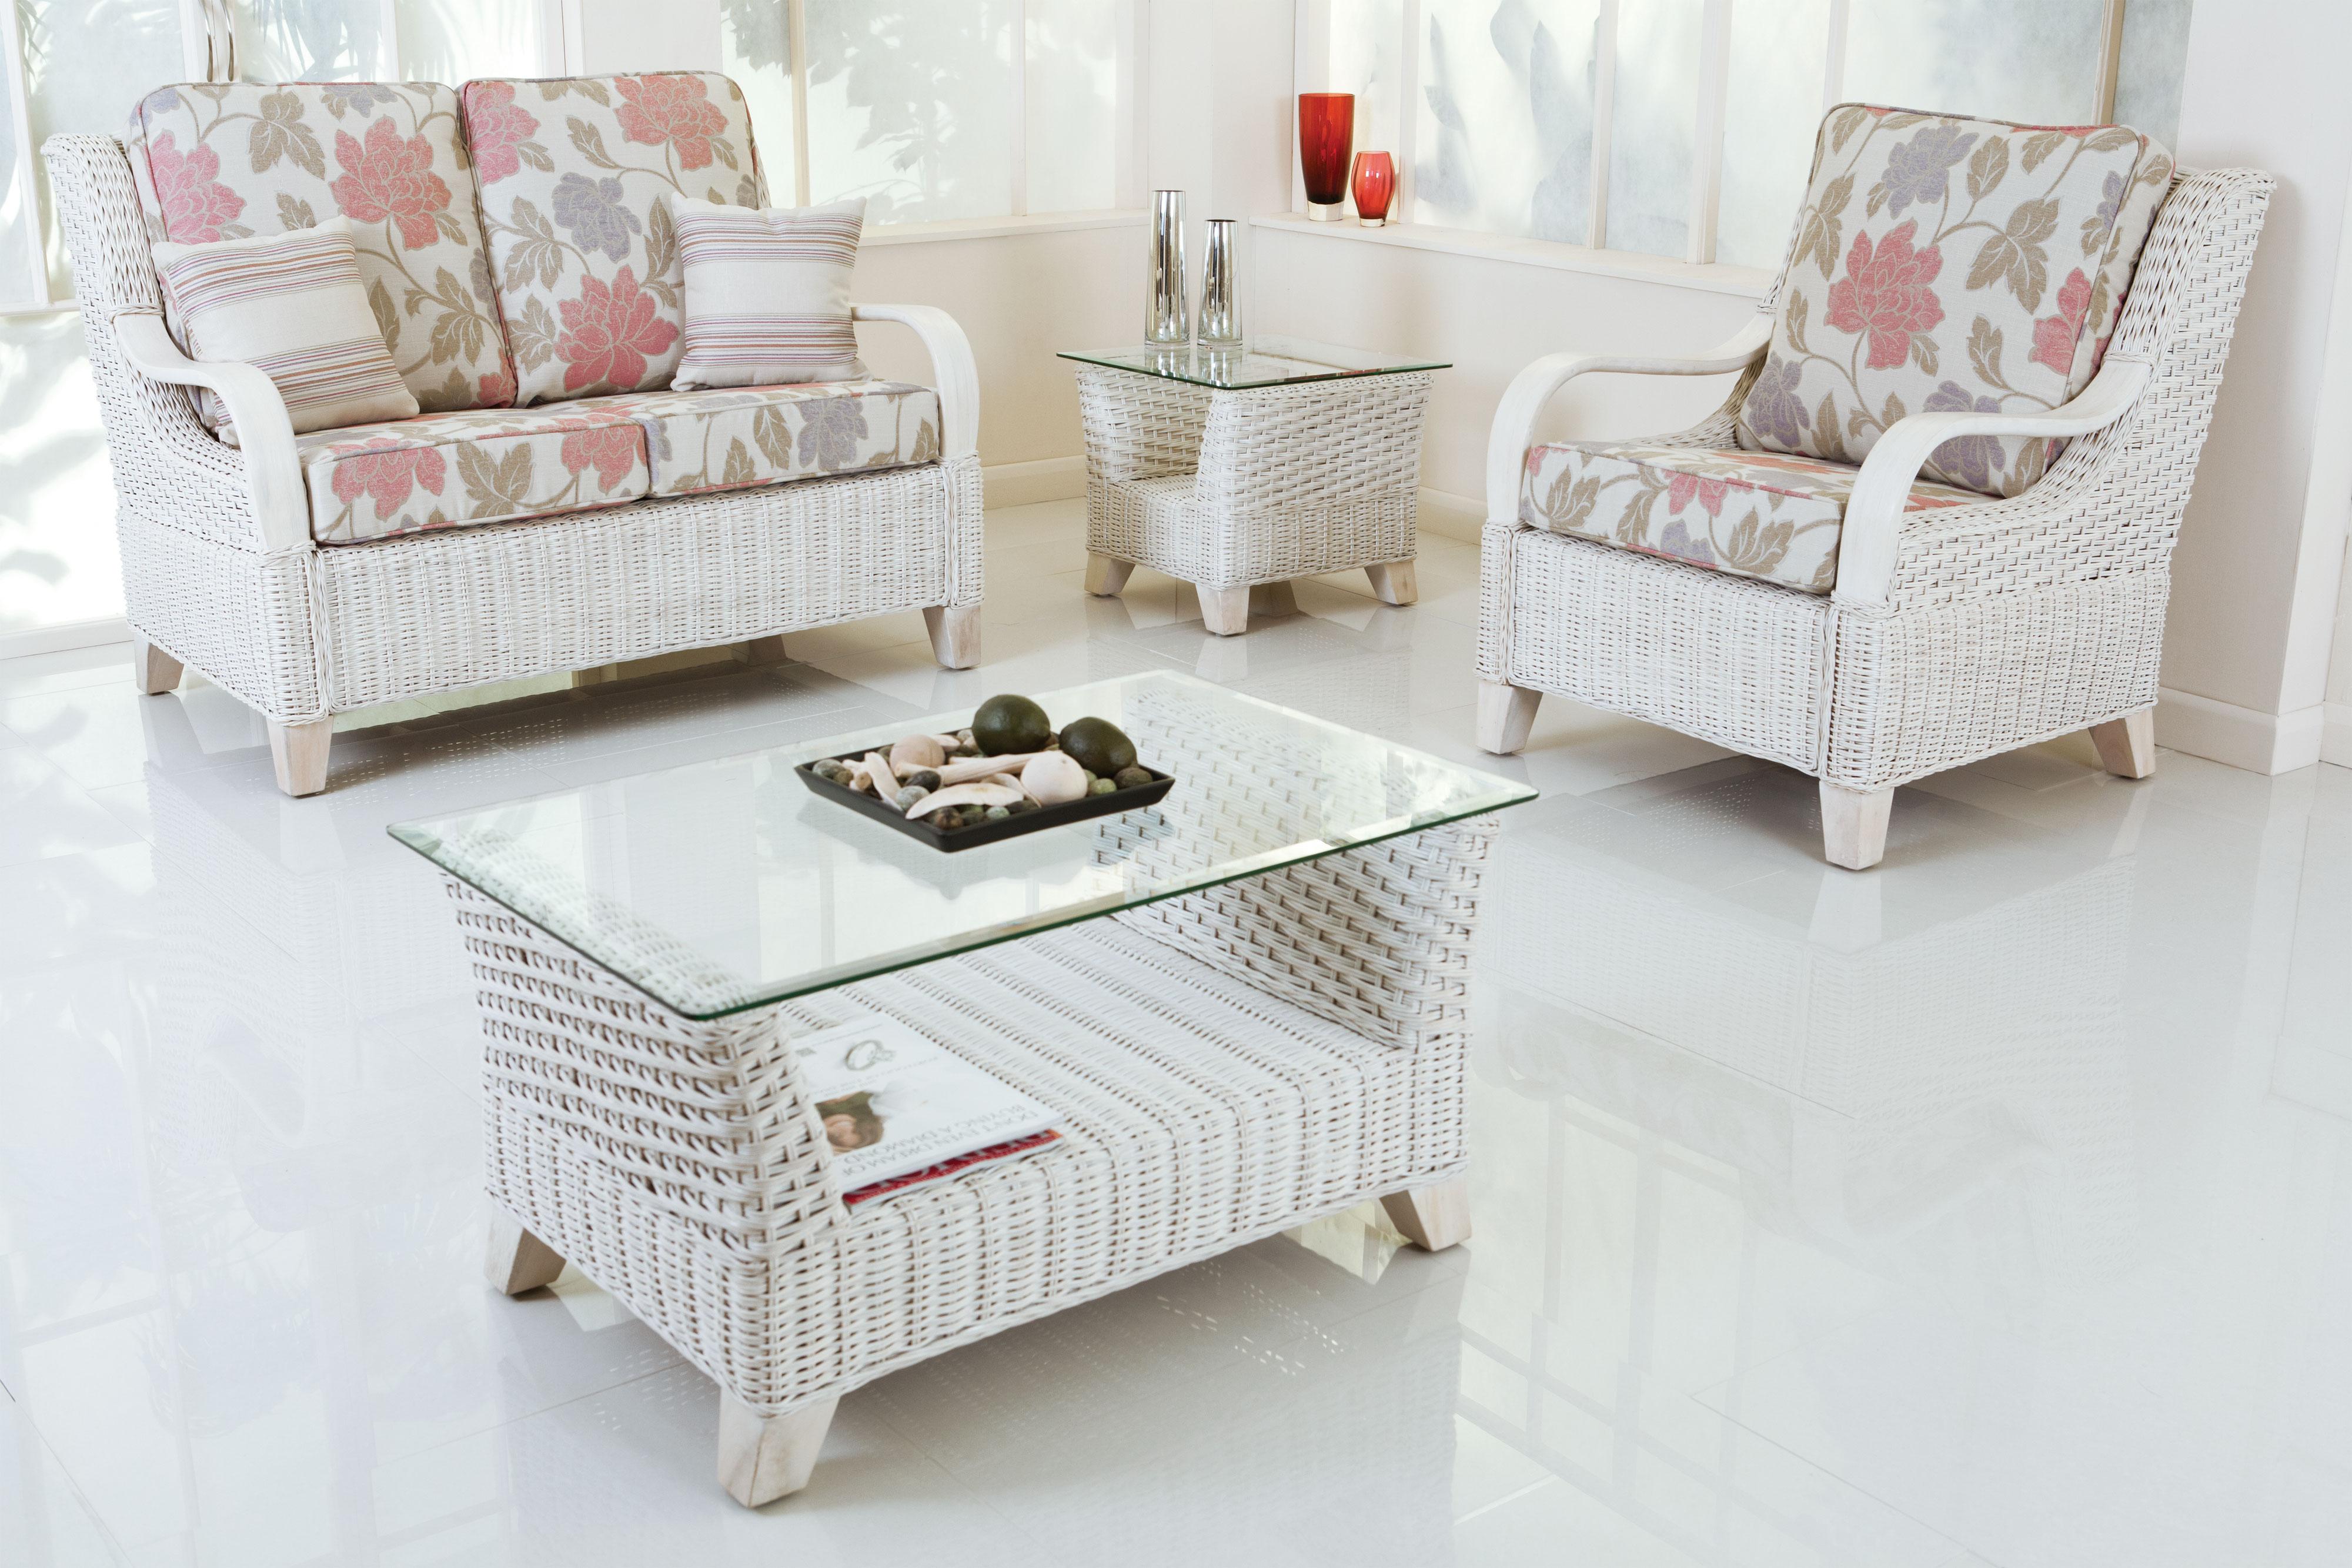 New Daro Website Daro Cane Furniture Rattan Furniture  : Sersley Web from www.daro-cane.co.uk size 4000 x 2667 jpeg 1352kB